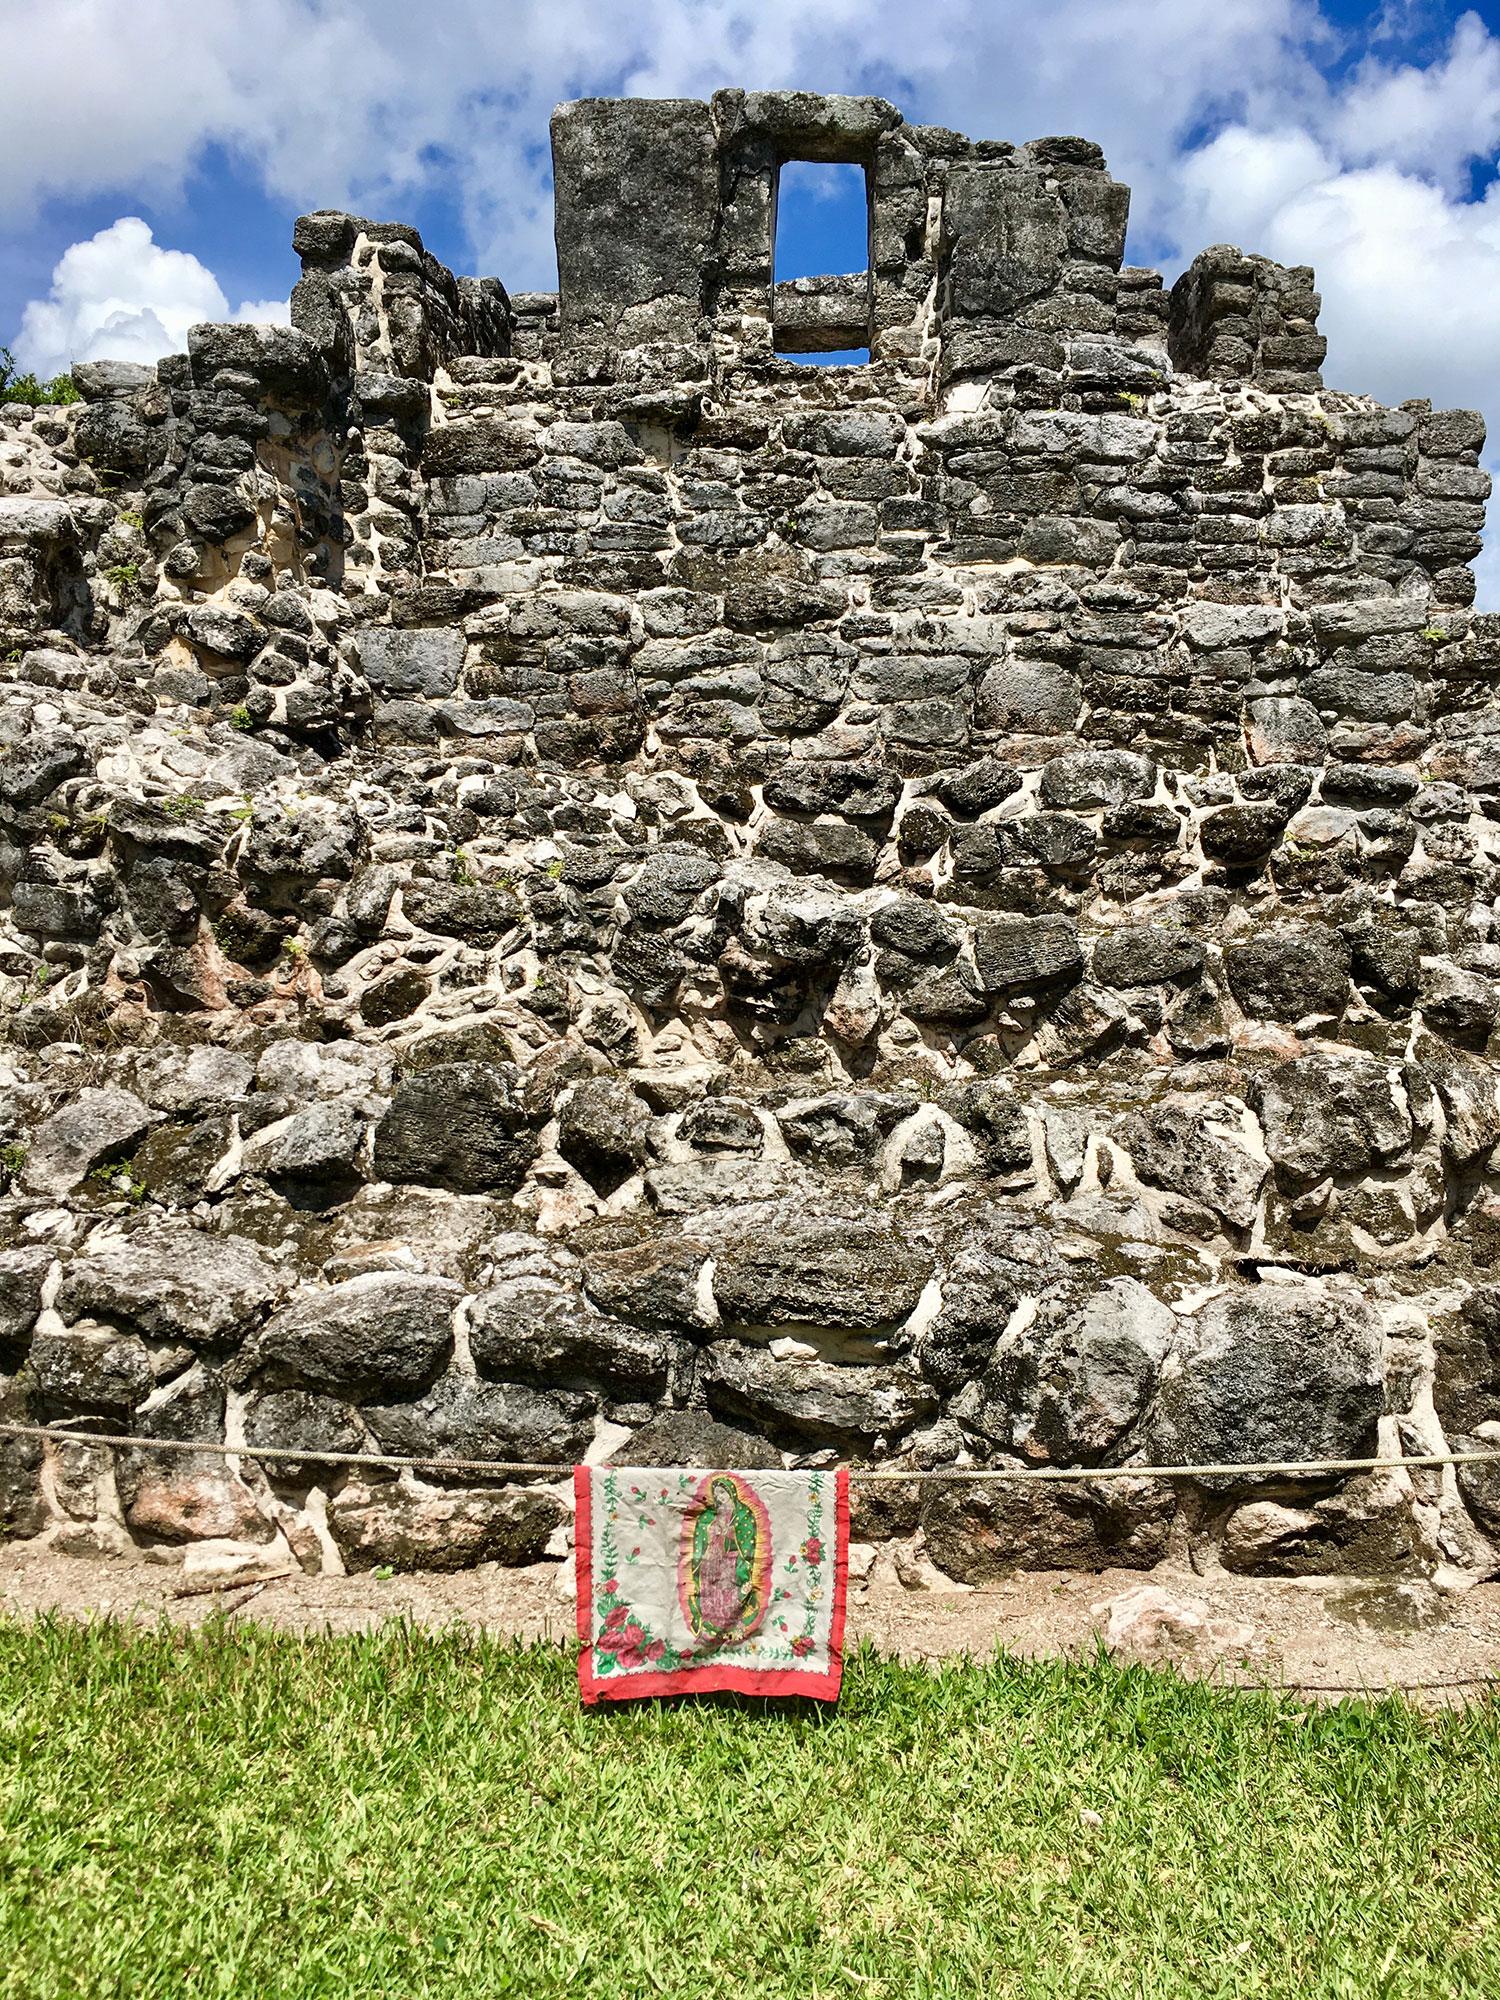 Hammocks_and_Ruins_What_to_Do_Mexico_Maya_pramids_San_Gervacio_Cozumel_51.jpg